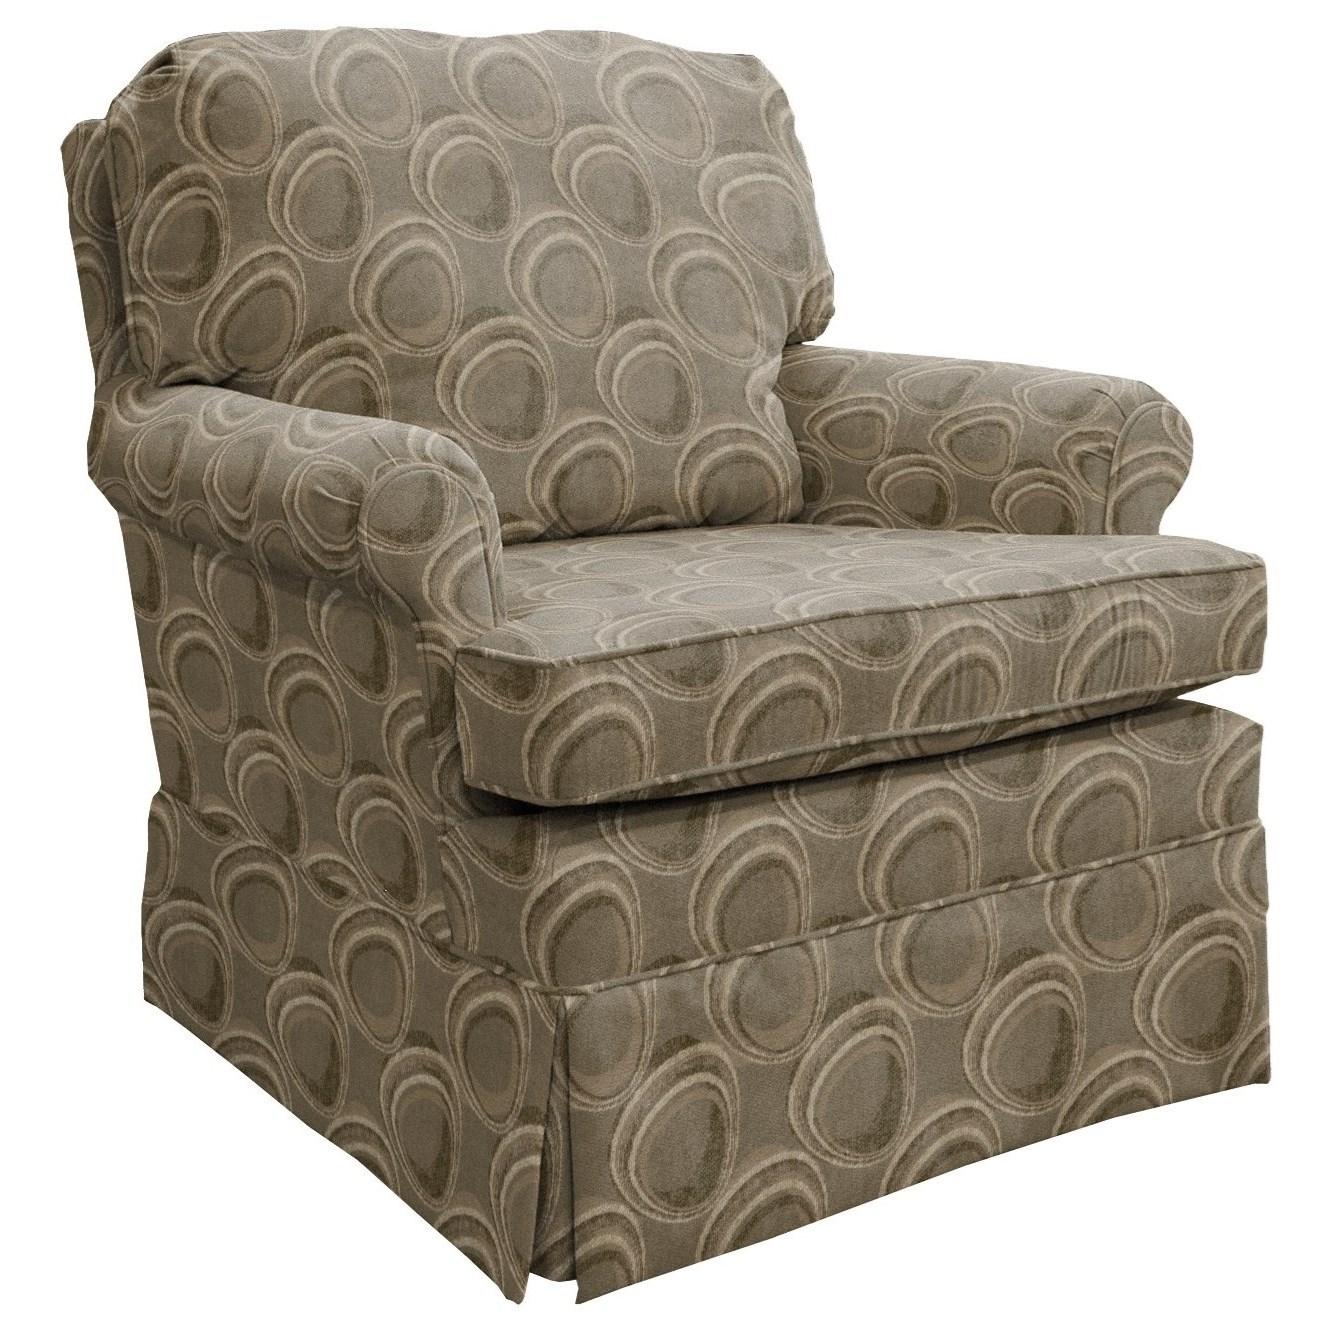 Best Home Furnishings Patoka Club Chair - Item Number: 2610-28733